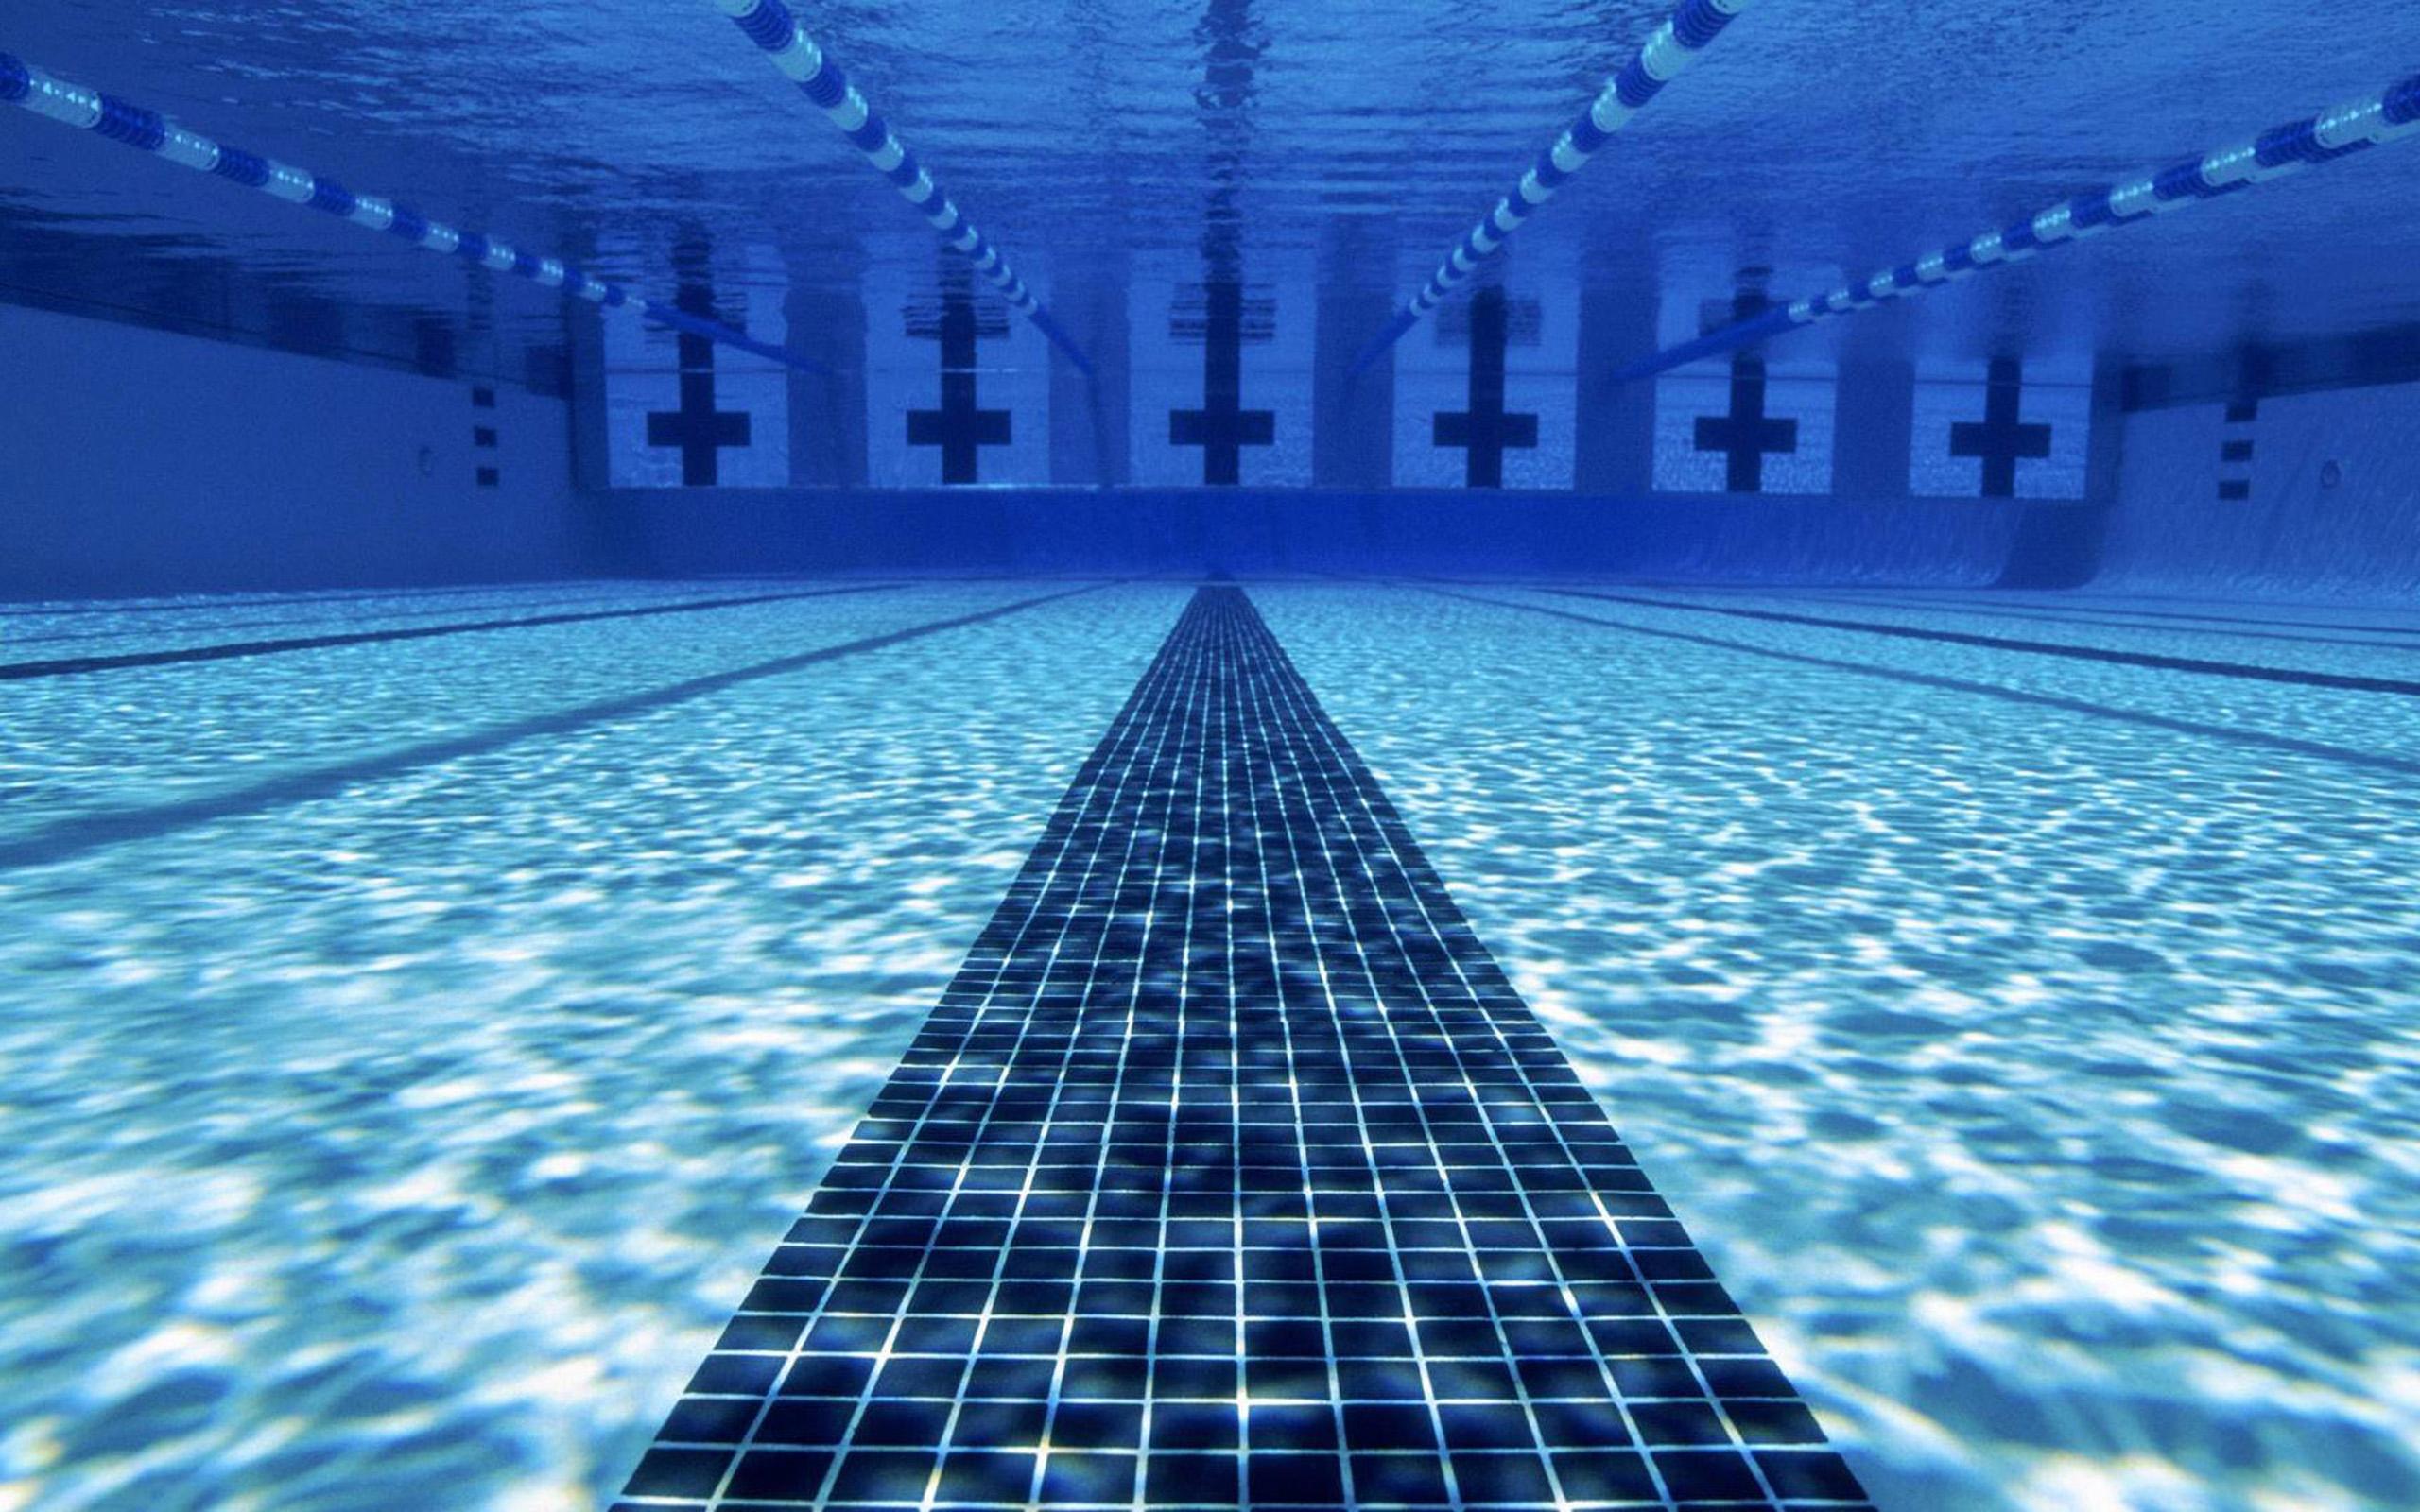 Water-pool-wallpaper-download-08-2560x1600